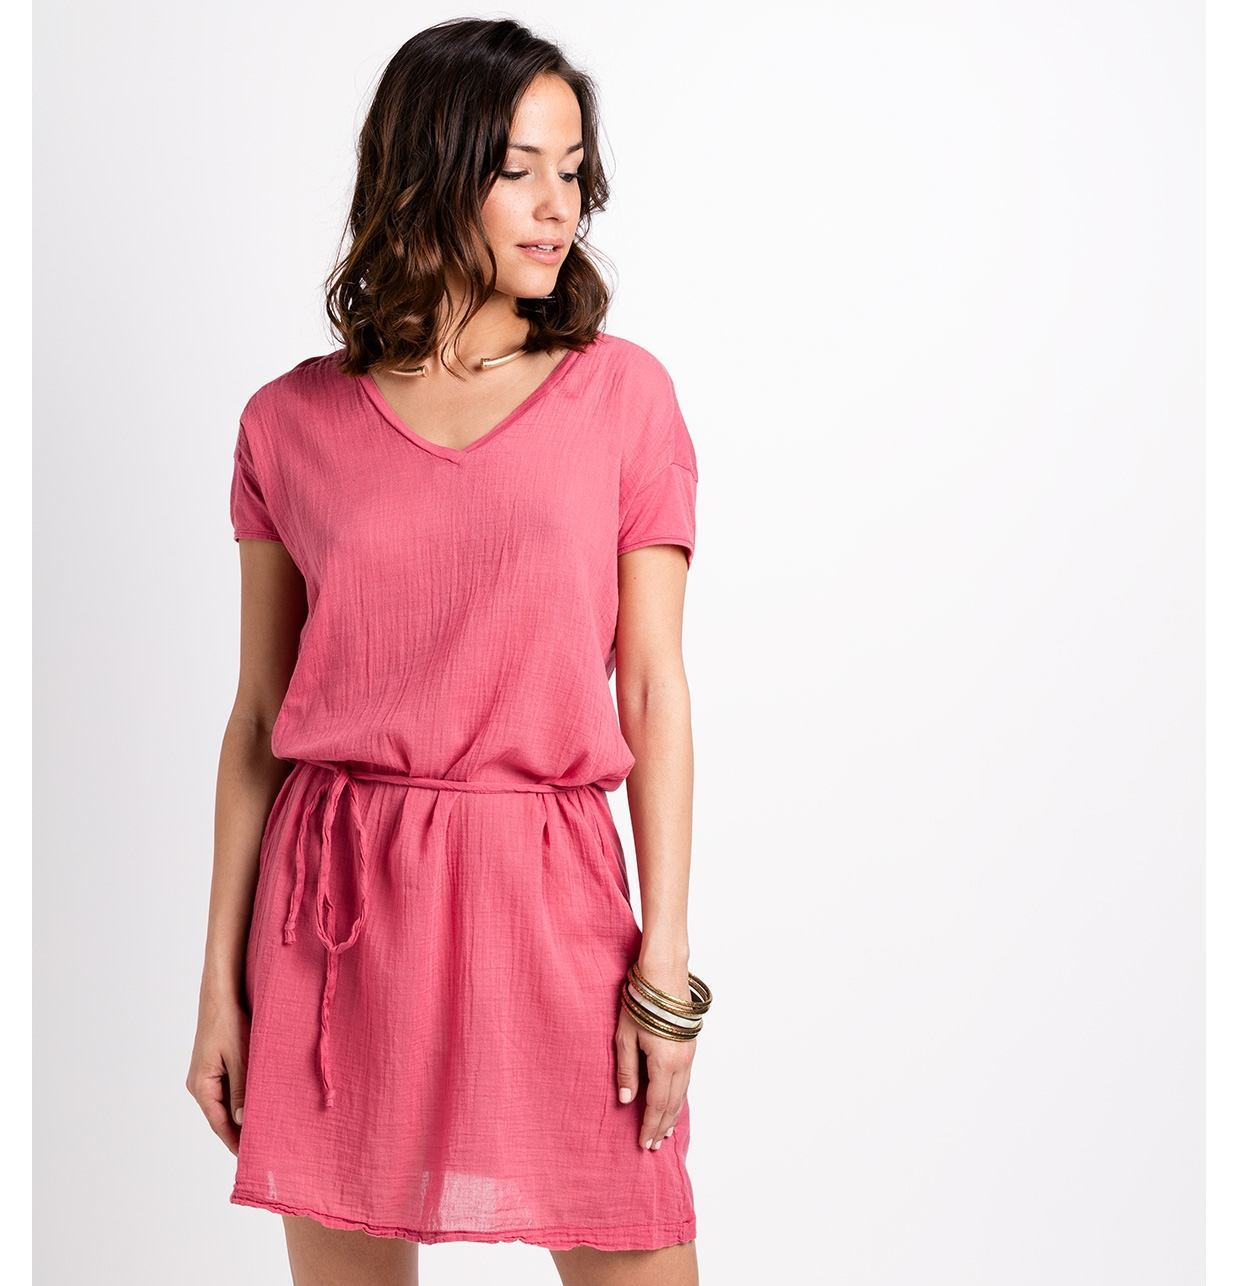 Vestido fluido manga corta modelo DRESS color rosa, 100% Algodón.